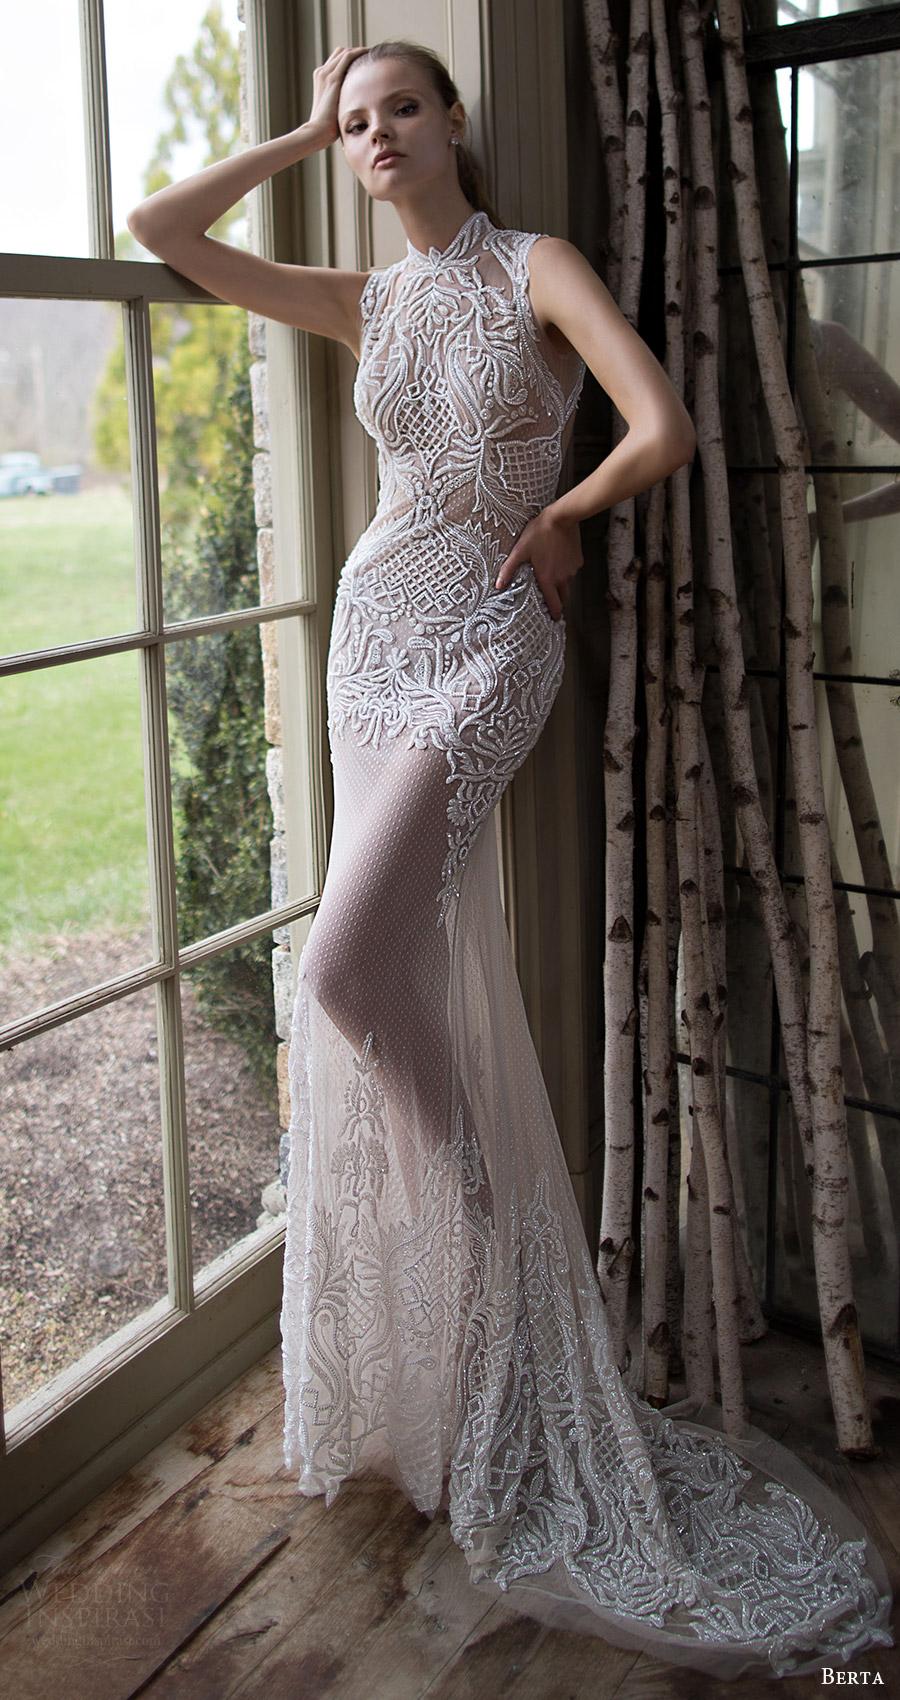 berta bridal fall 2016 sleeveless high neck trumpet wedding dress (16 116) mv